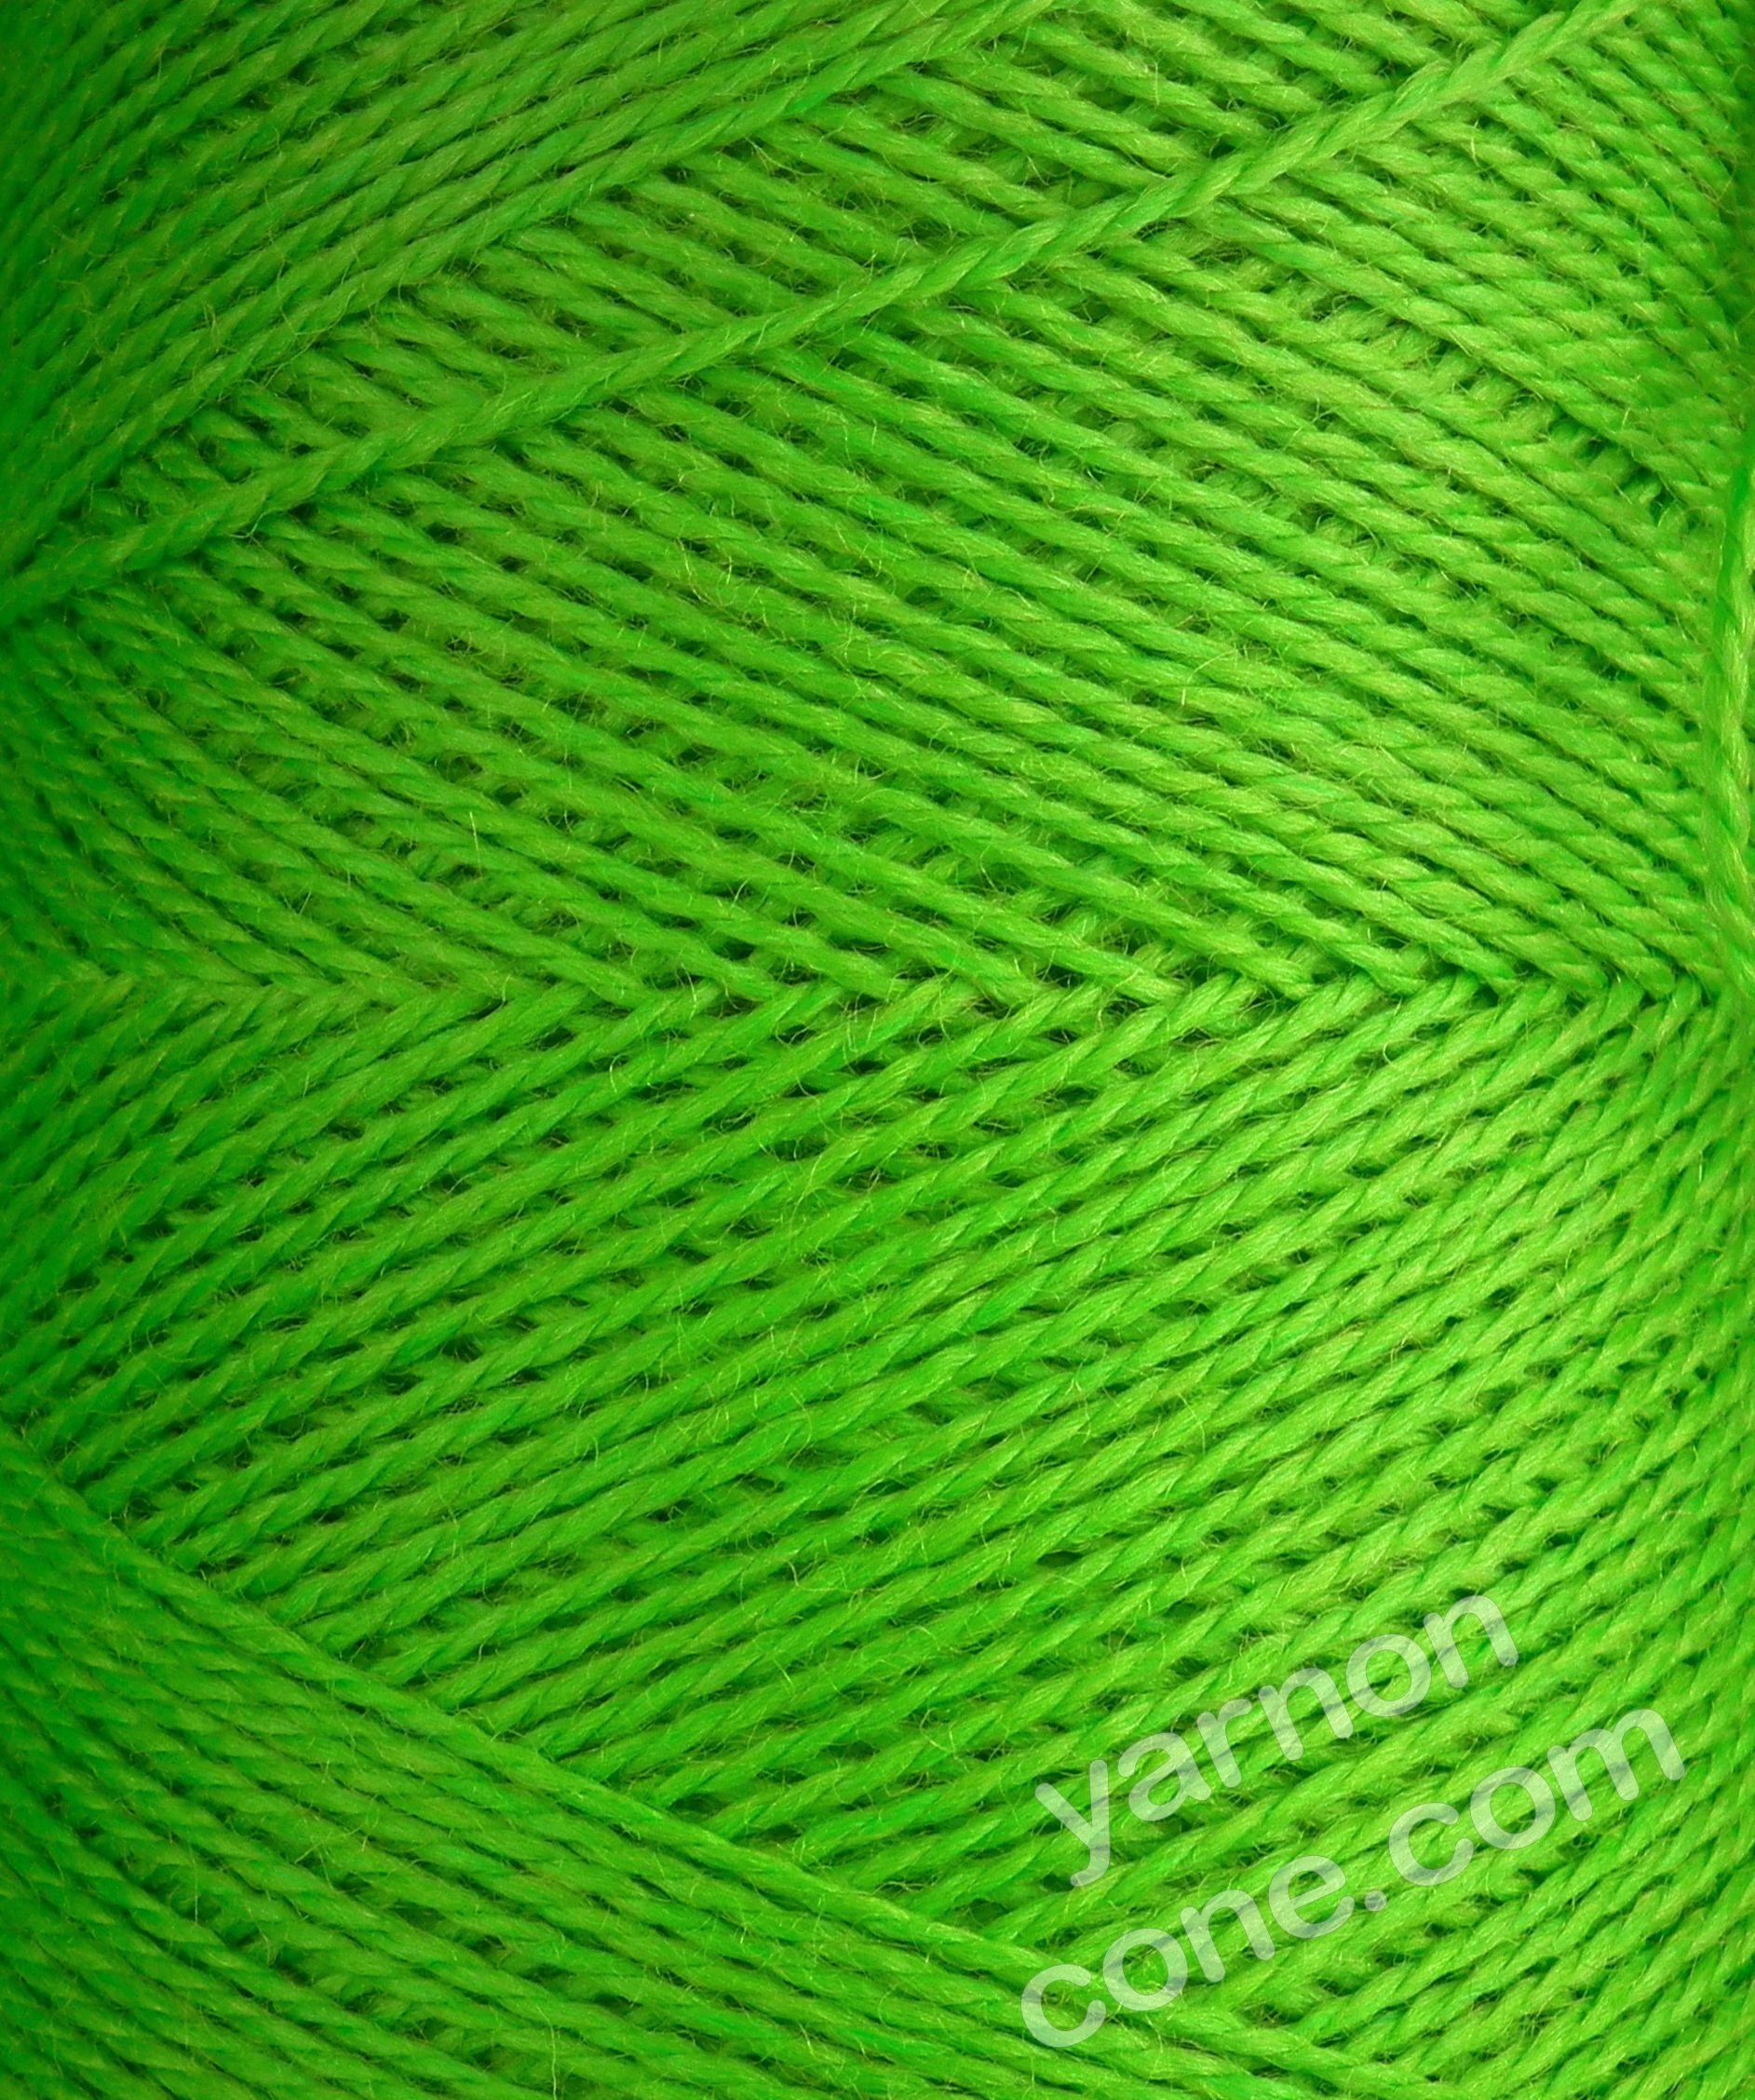 Jura weaving wool 4 ply yarn cone lime green